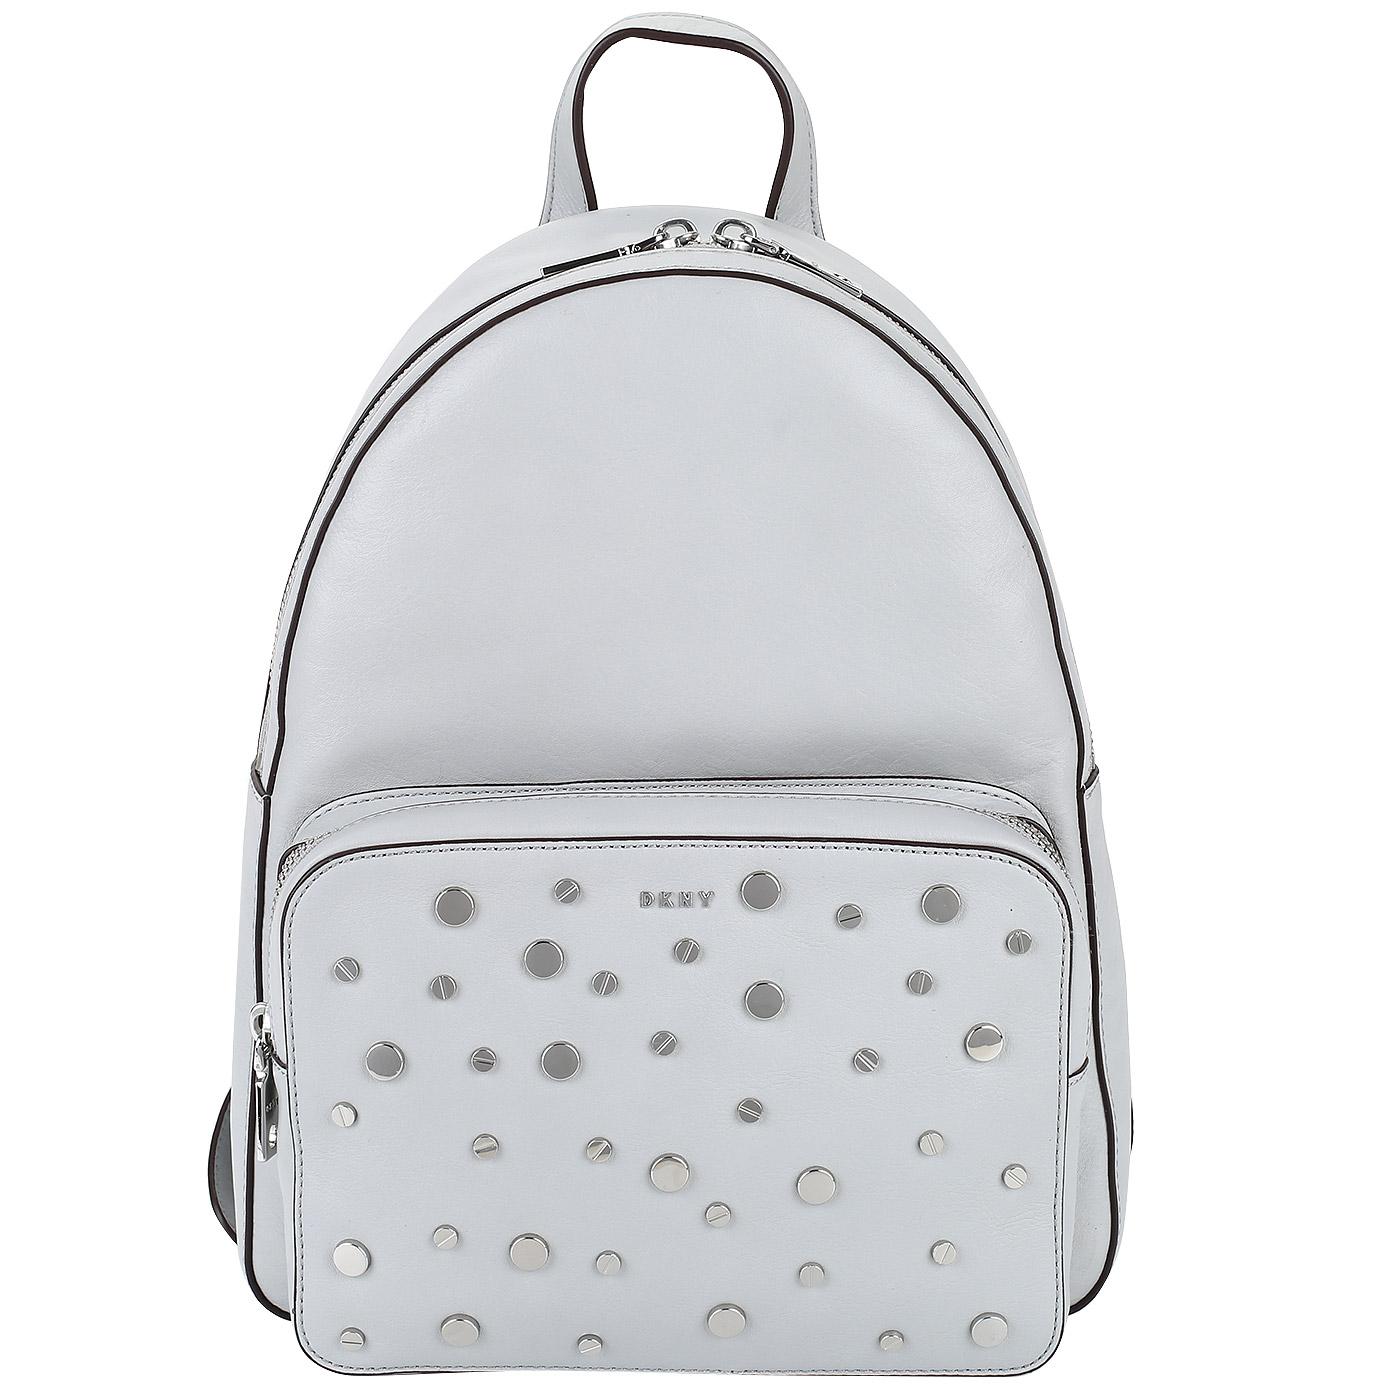 797a7f149b85 Кожаный рюкзак с клепками DKNY Bari Кожаный рюкзак с клепками DKNY Bari ...